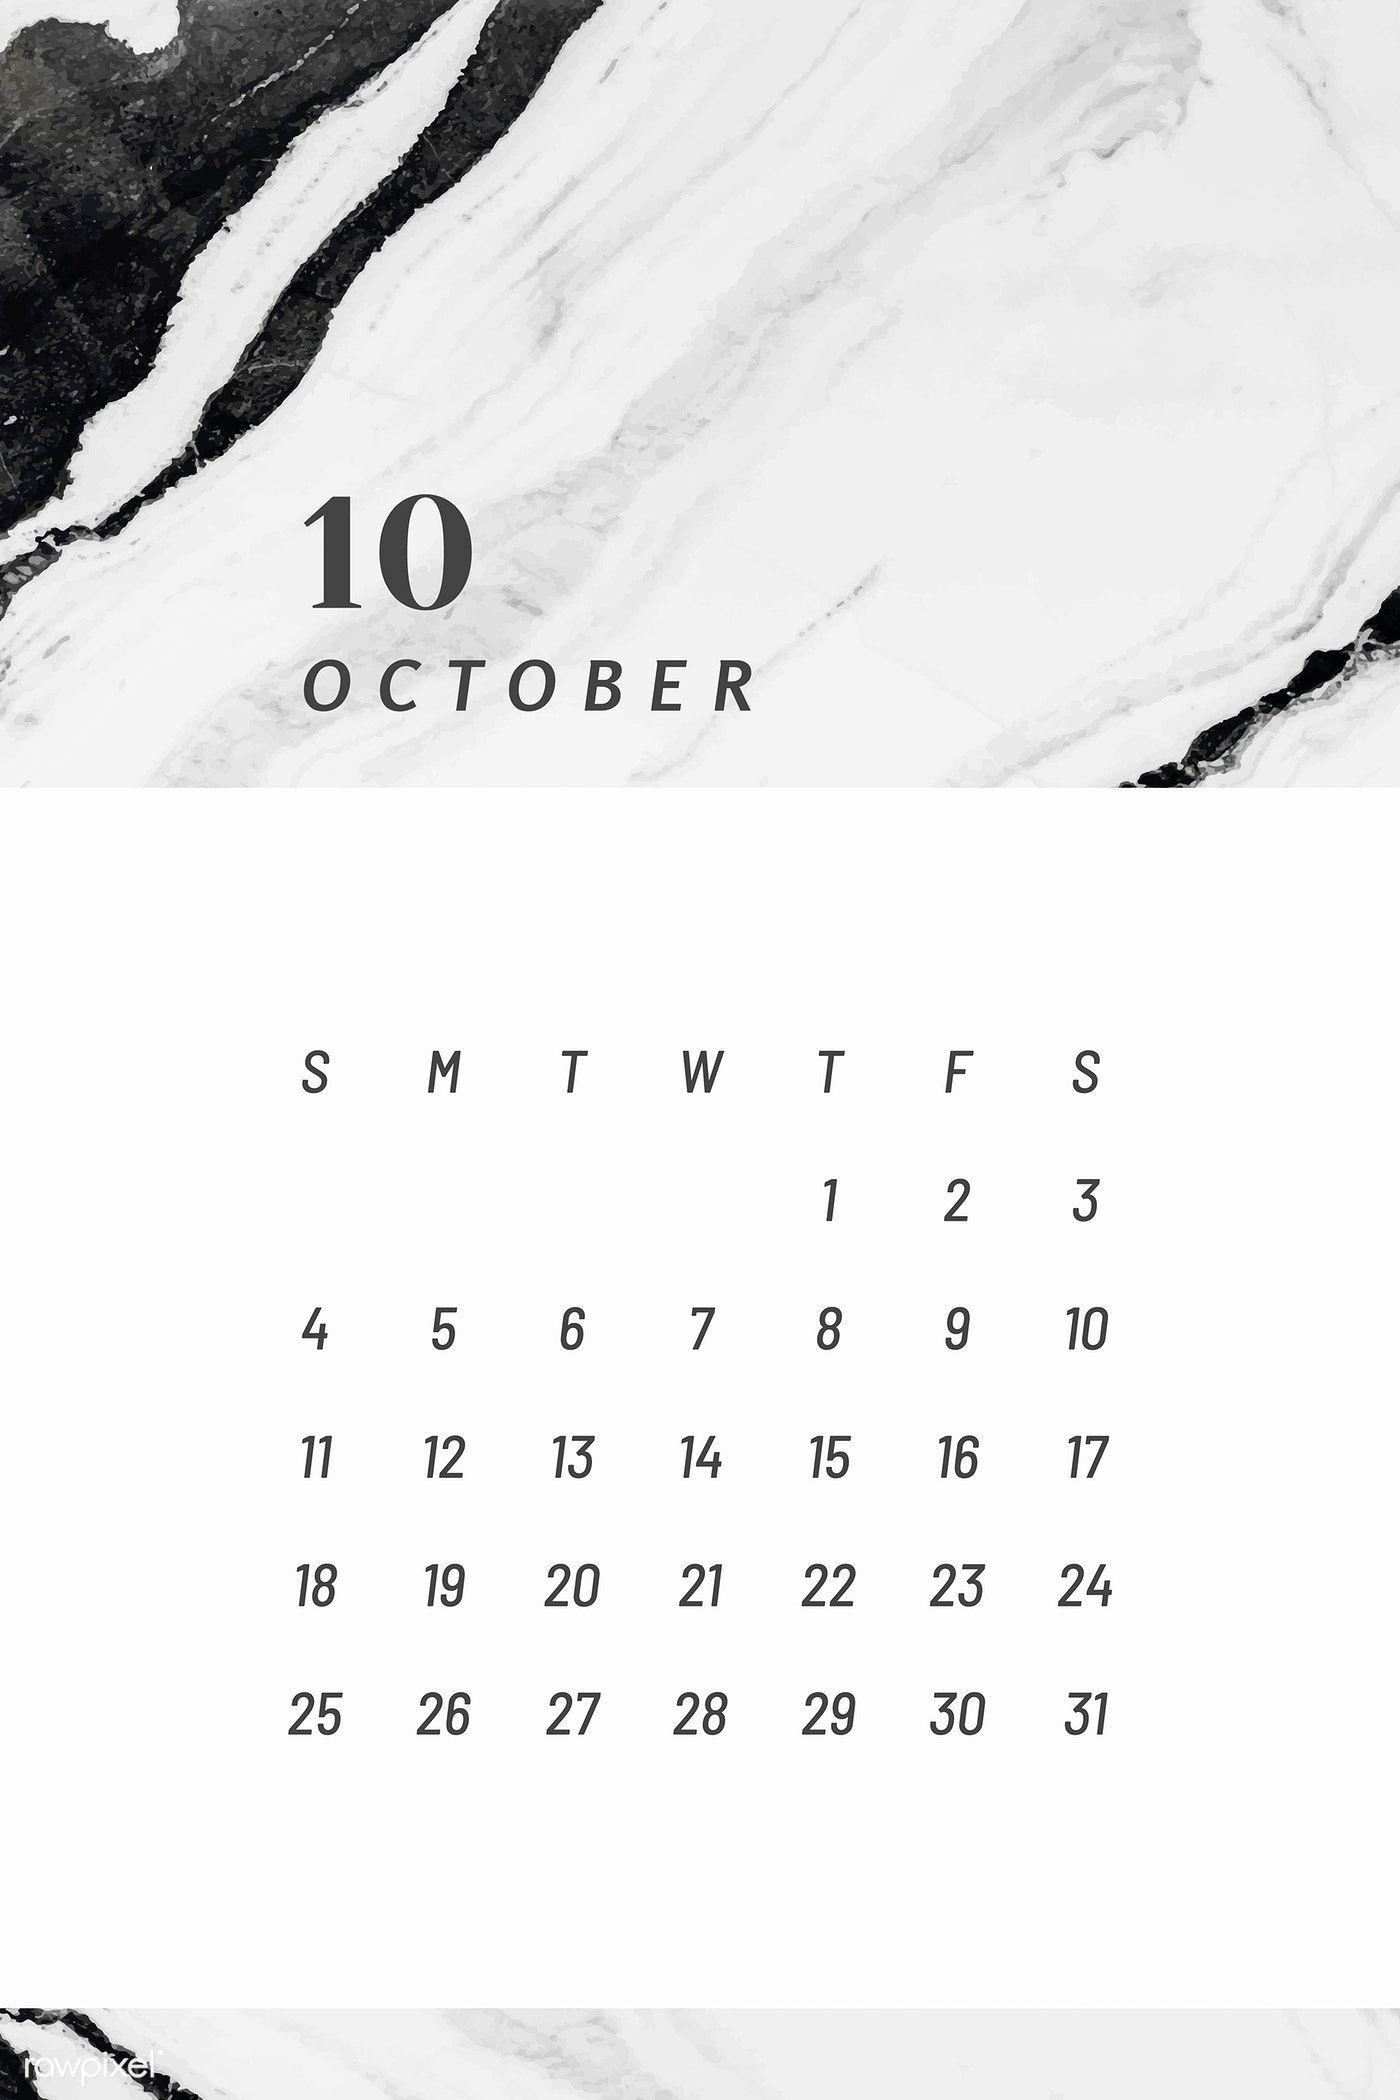 Download Premium Vector Of Black October Calendar